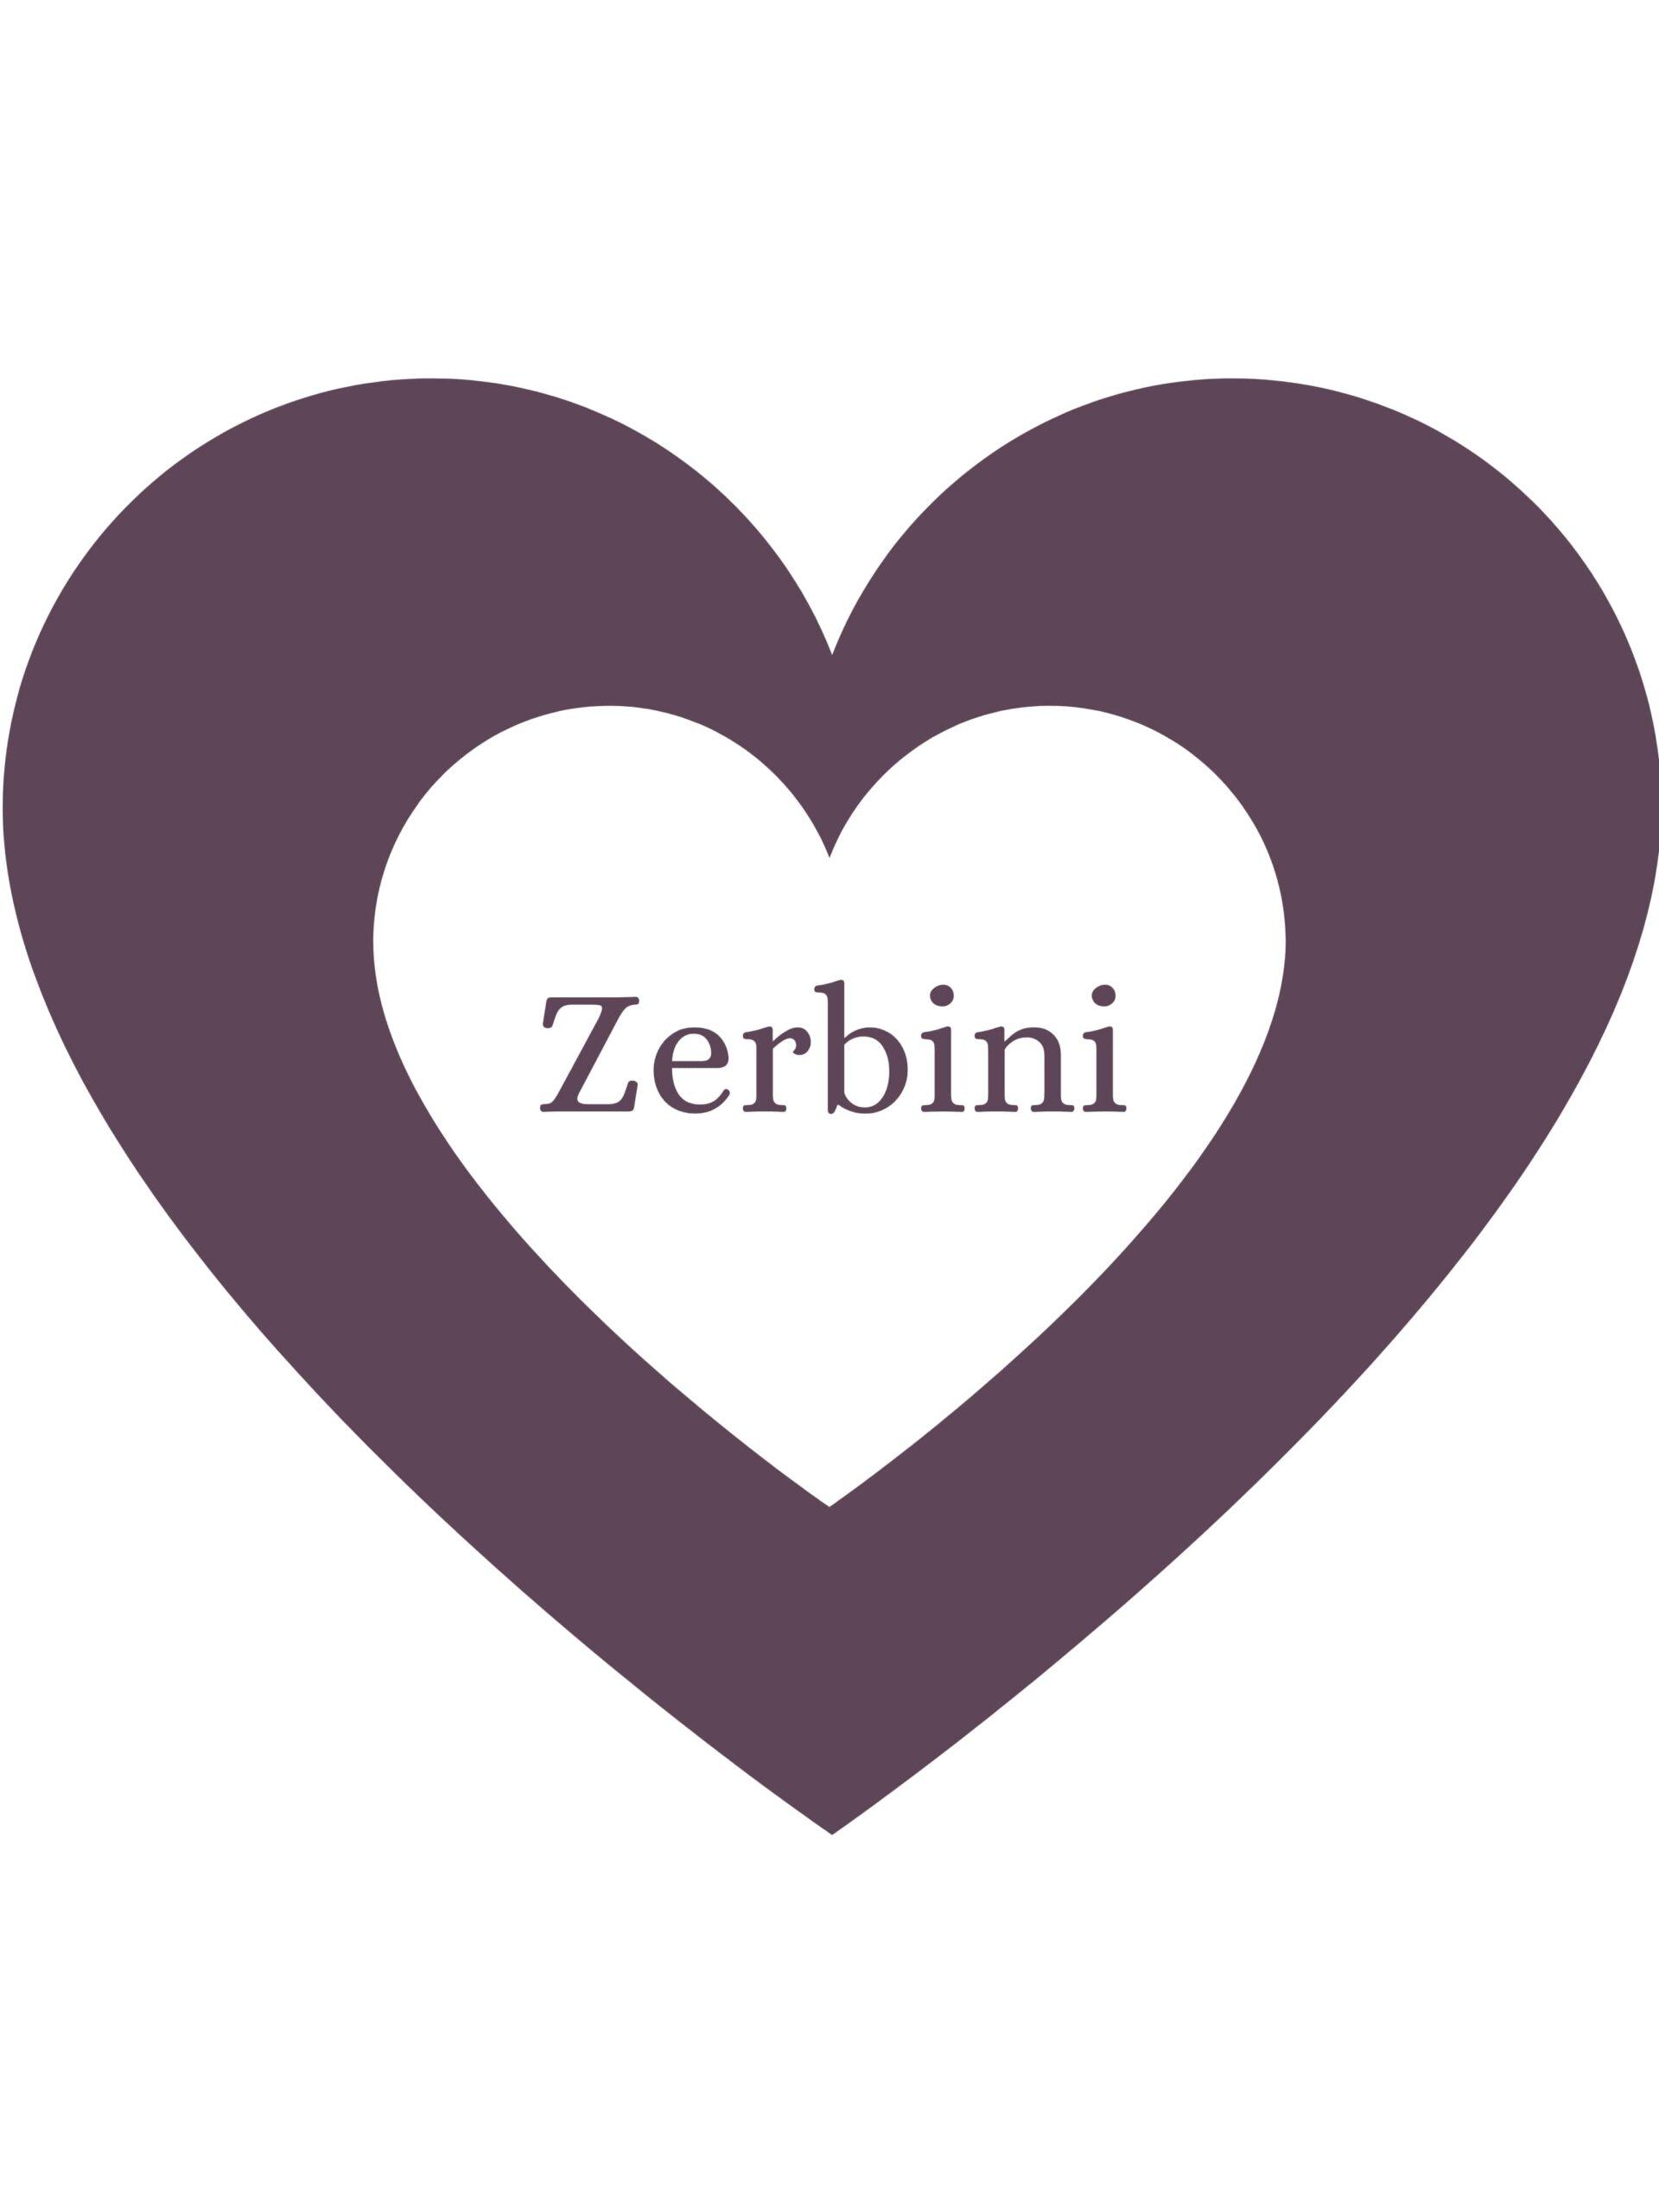 Zerbini